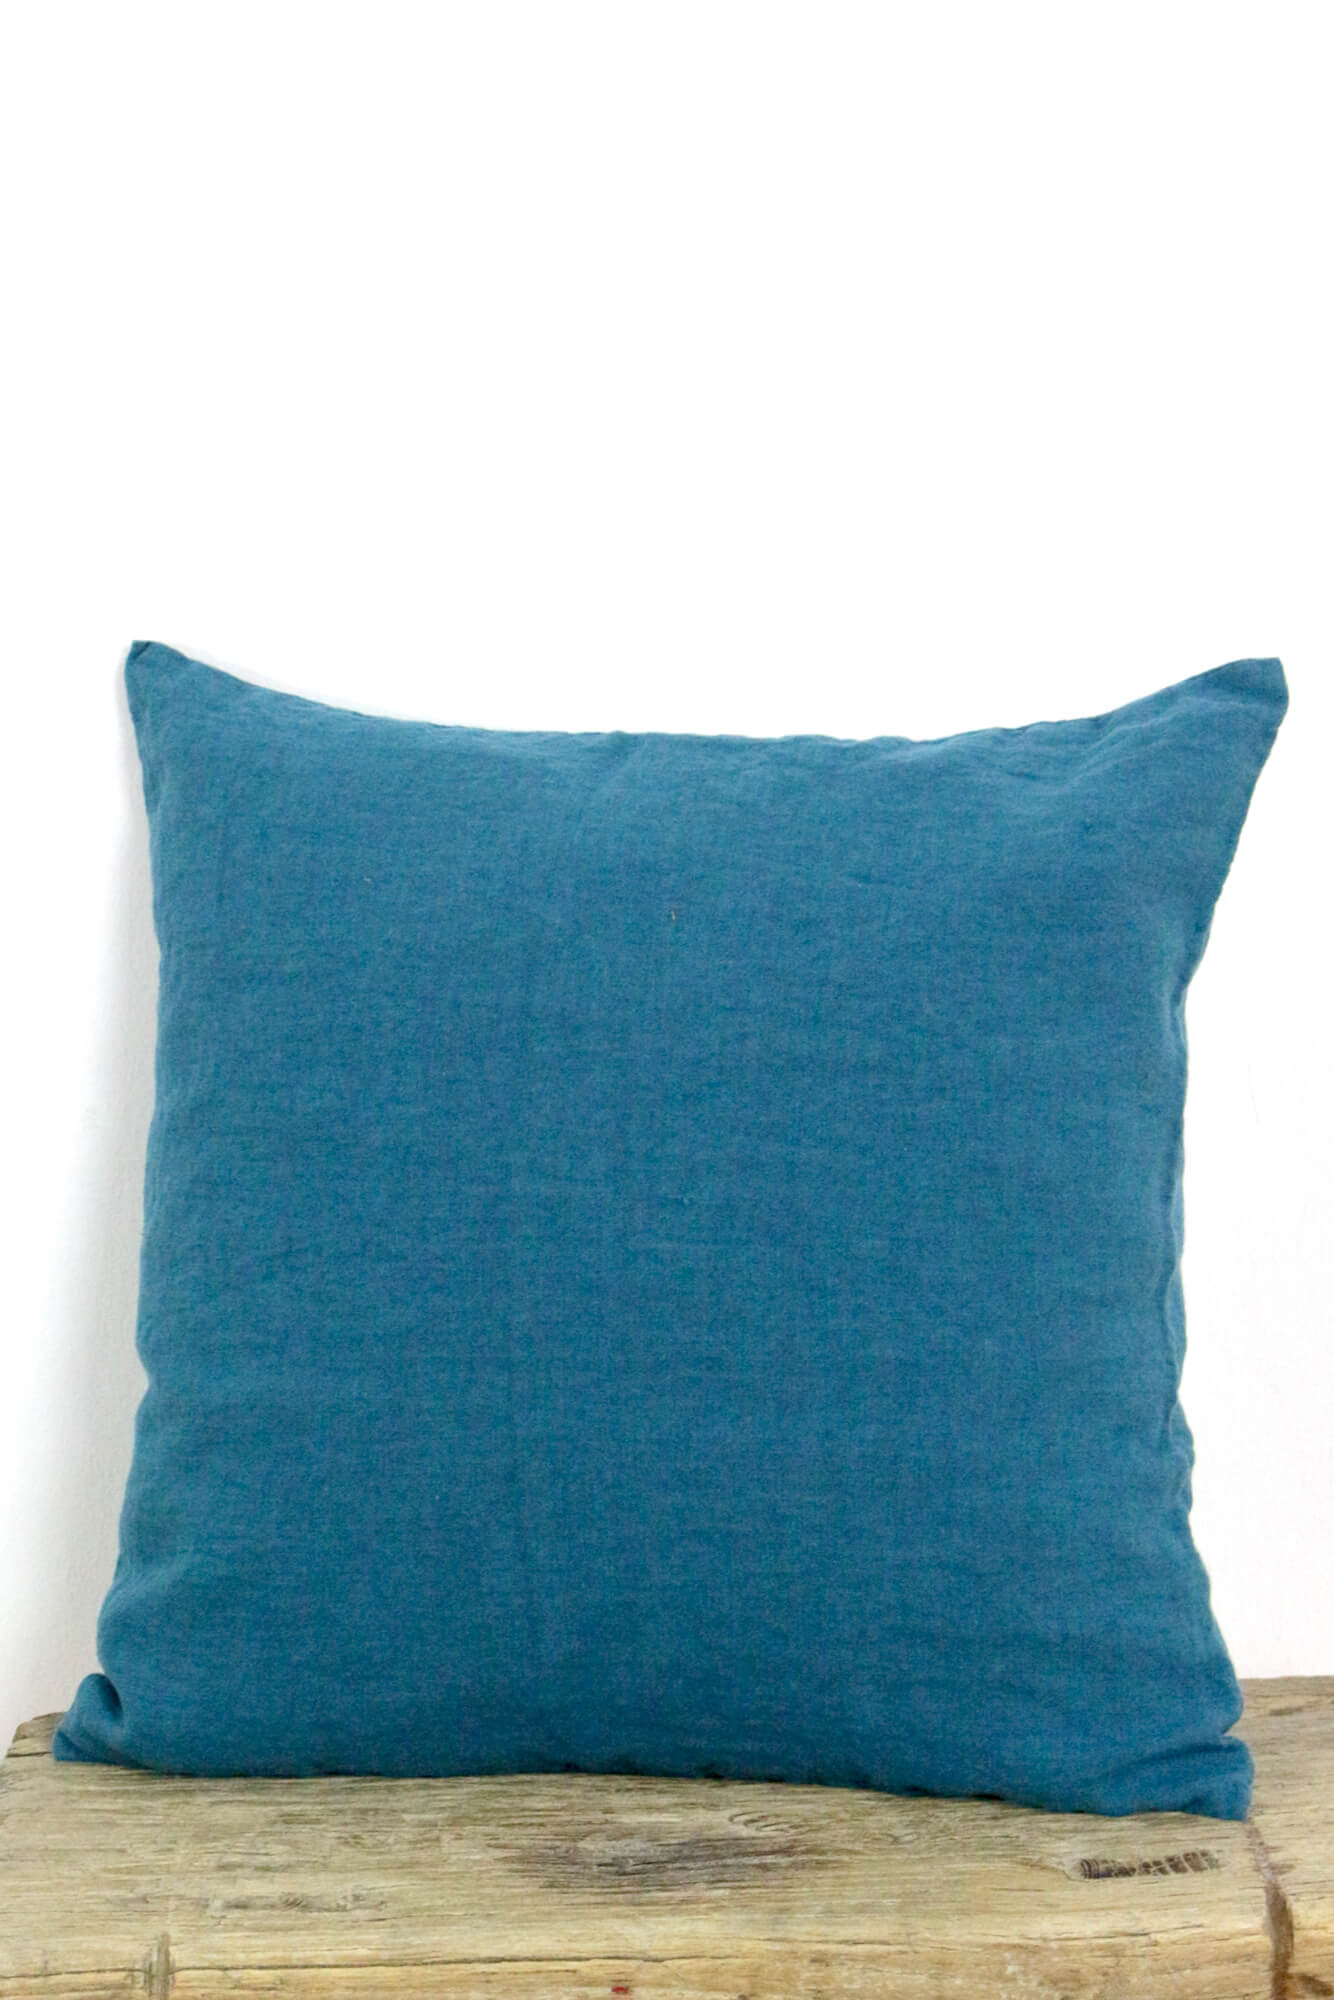 Kissenbezug Knitterleinen meerblau 40x40